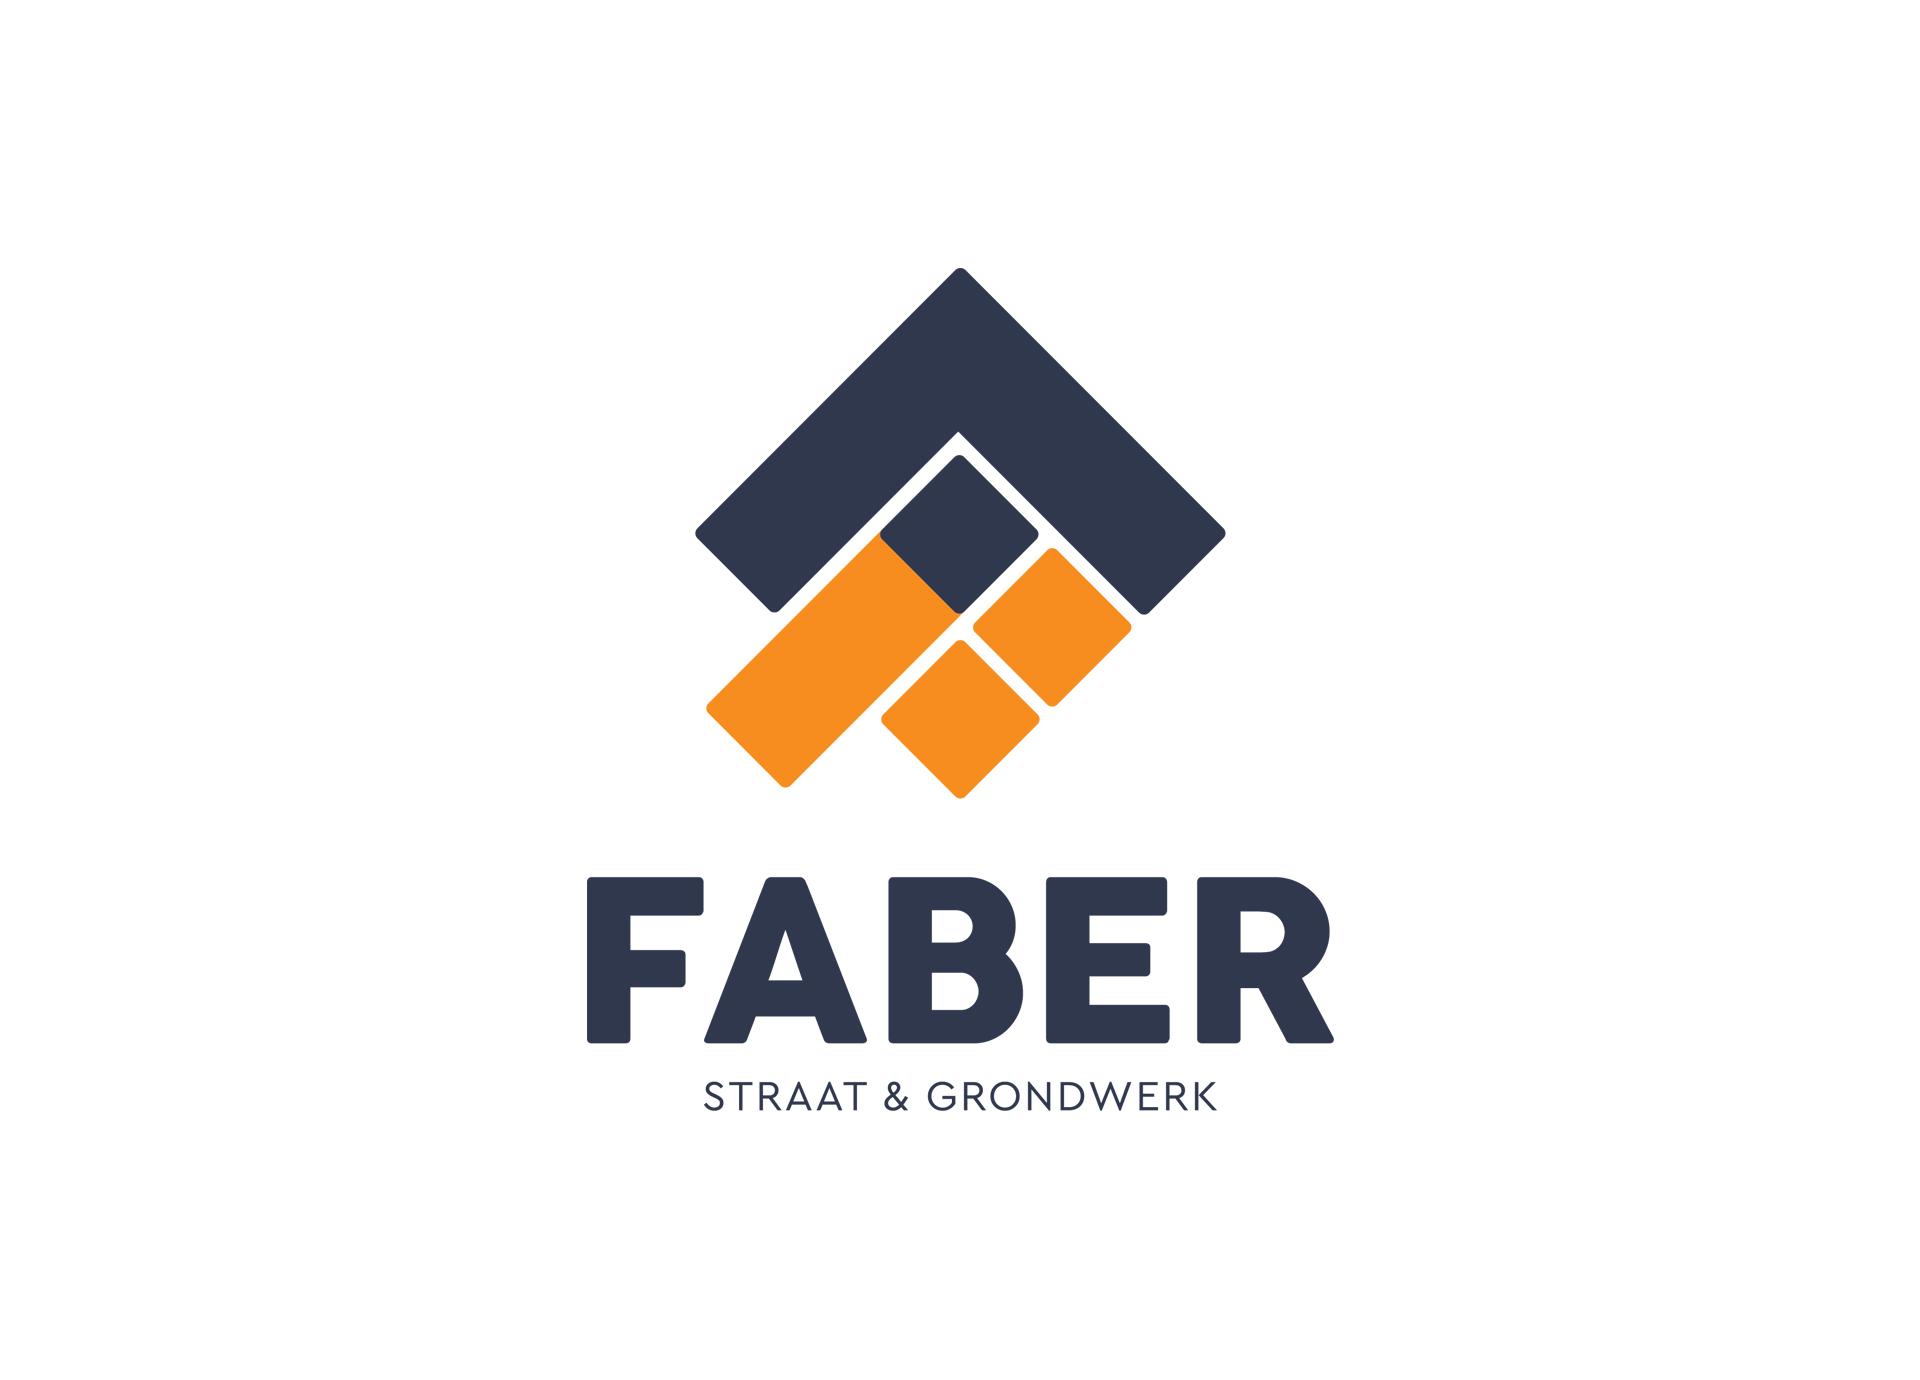 A Faber